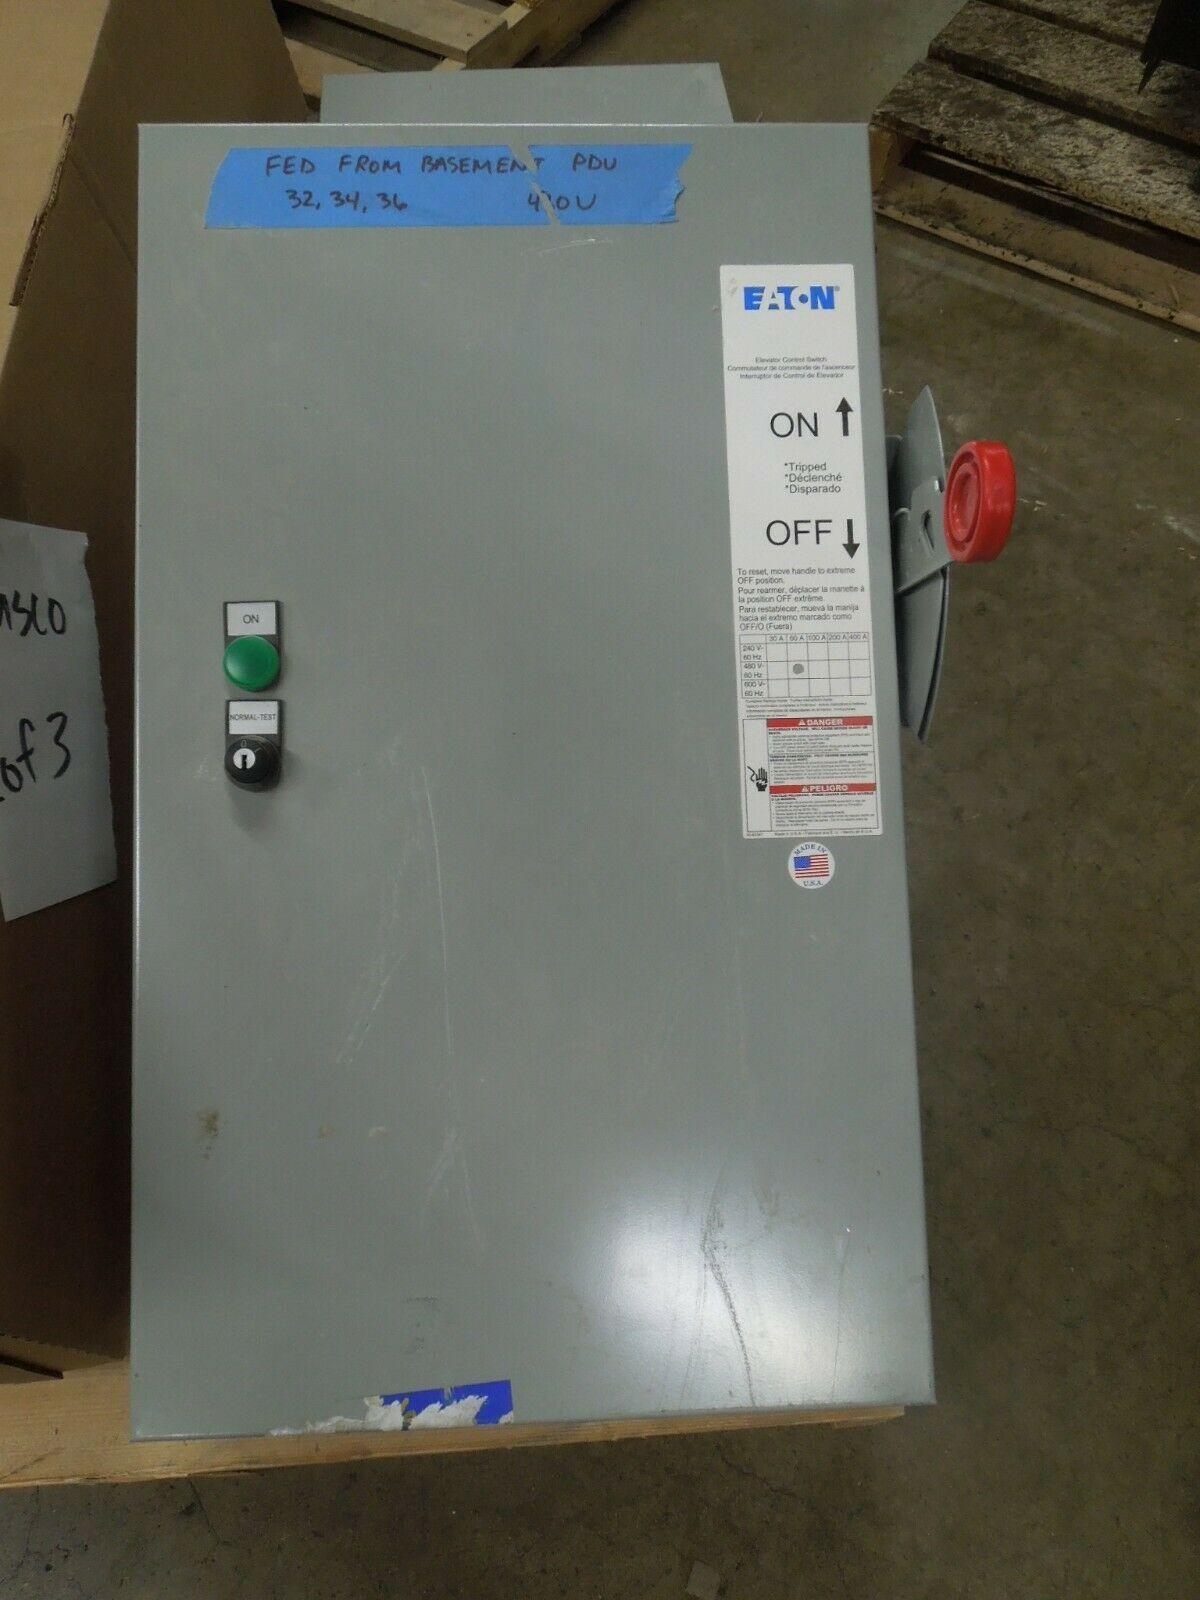 Eaton ES2T1R1GF3NB 60A 3p 480V Fusible Elevator Control Switch Type 1 Enclosure - $1,250.00